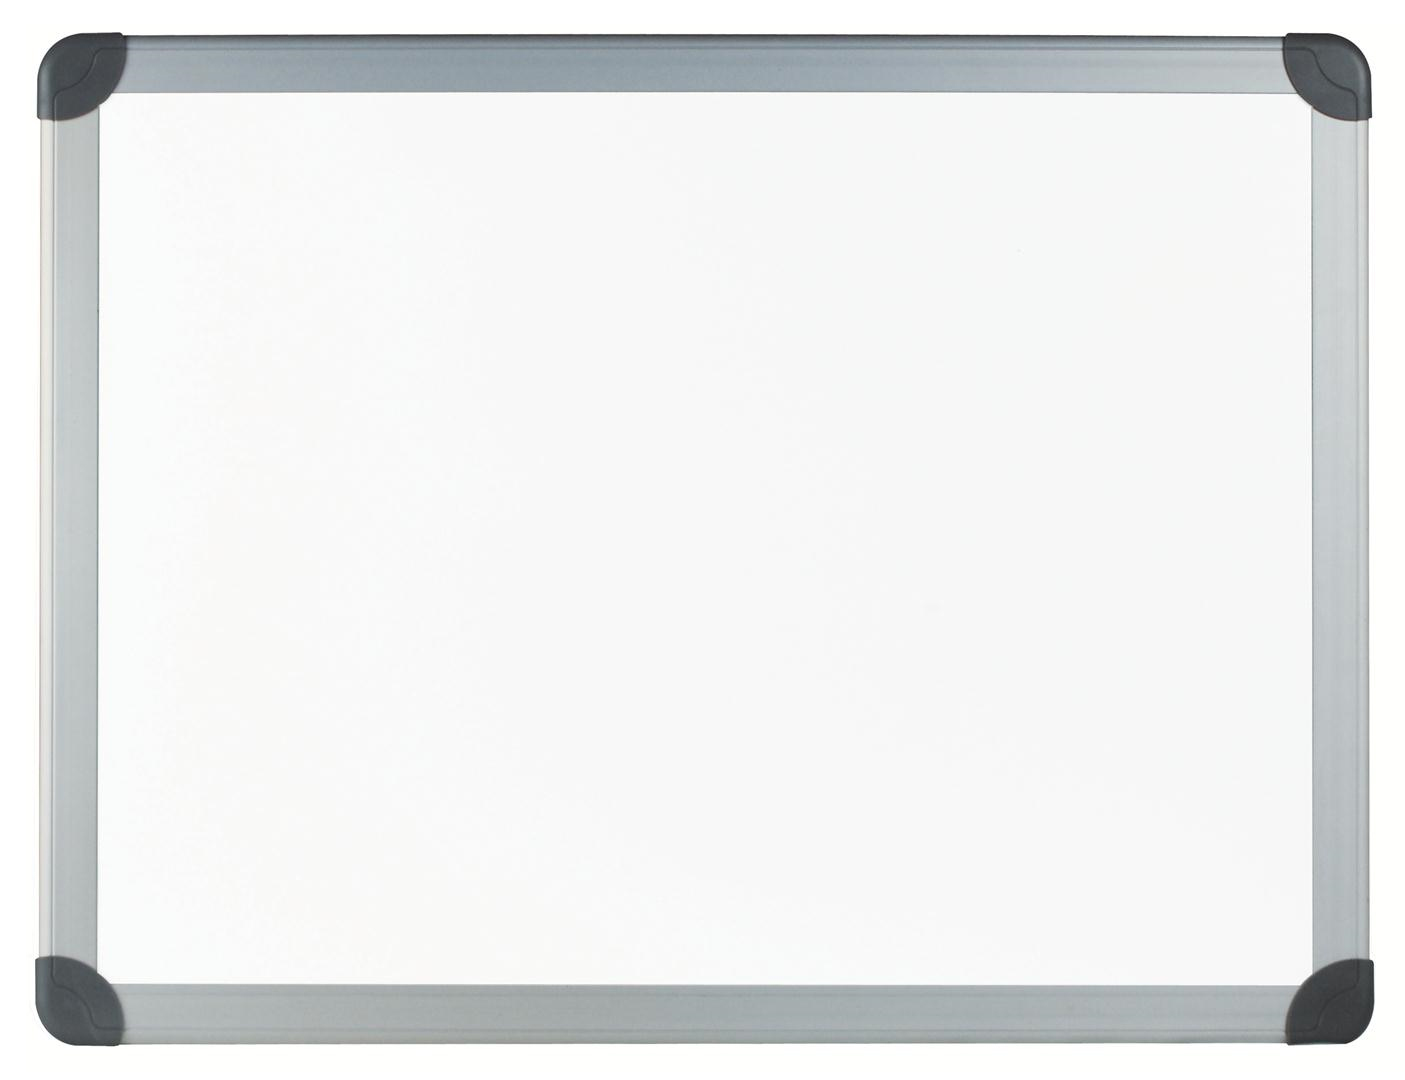 whiteboard clipart clipart kid